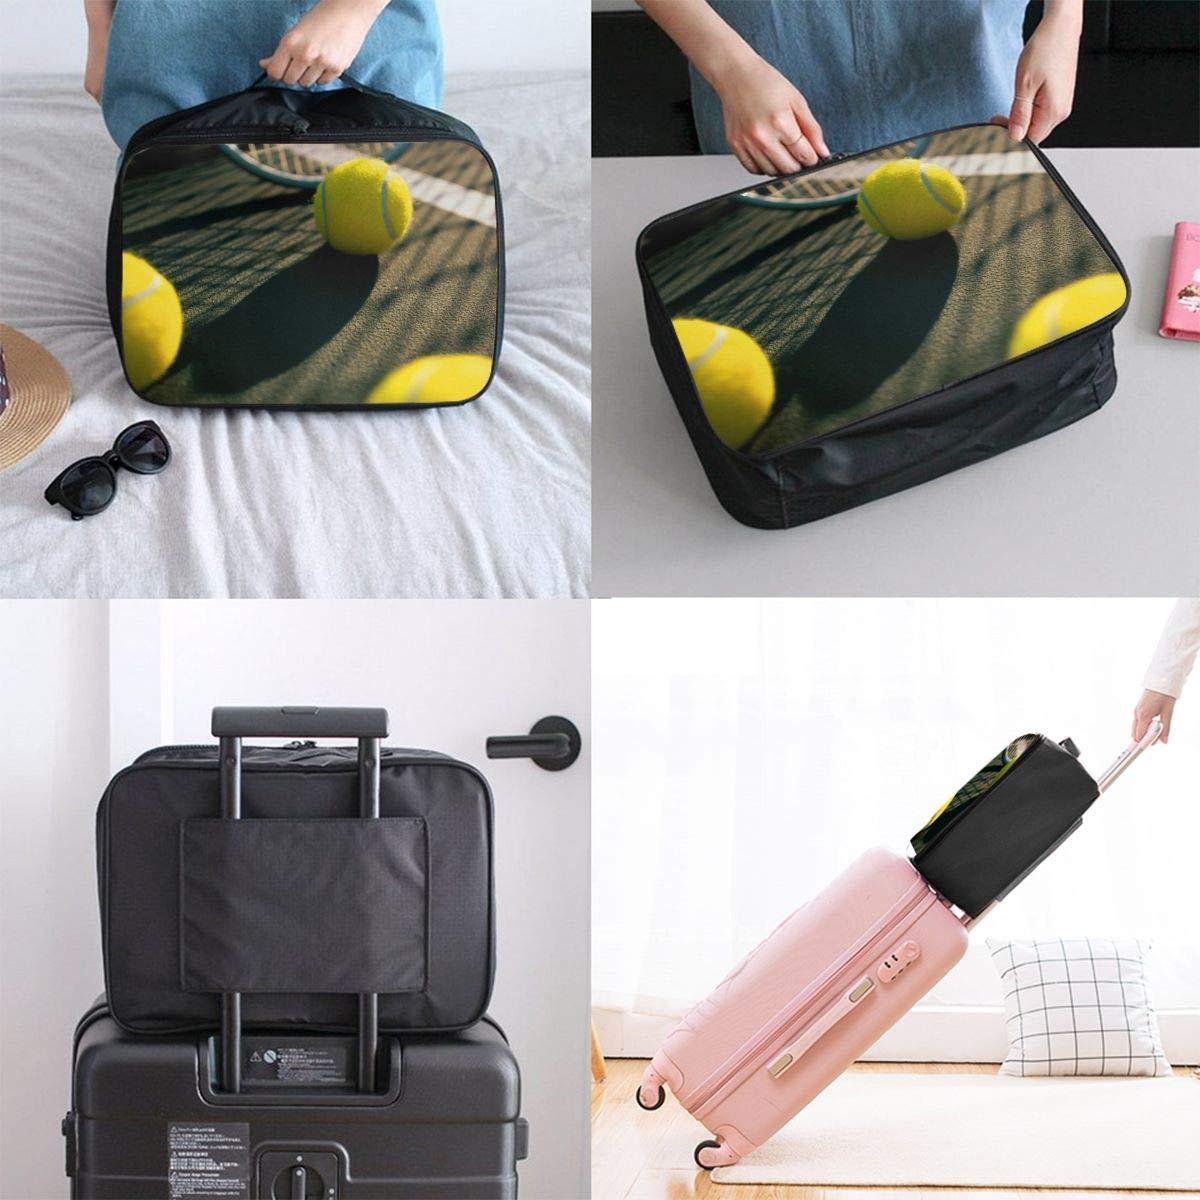 Travel Luggage Duffle Bag Lightweight Portable Handbag Tennis Large Capacity Waterproof Foldable Storage Tote